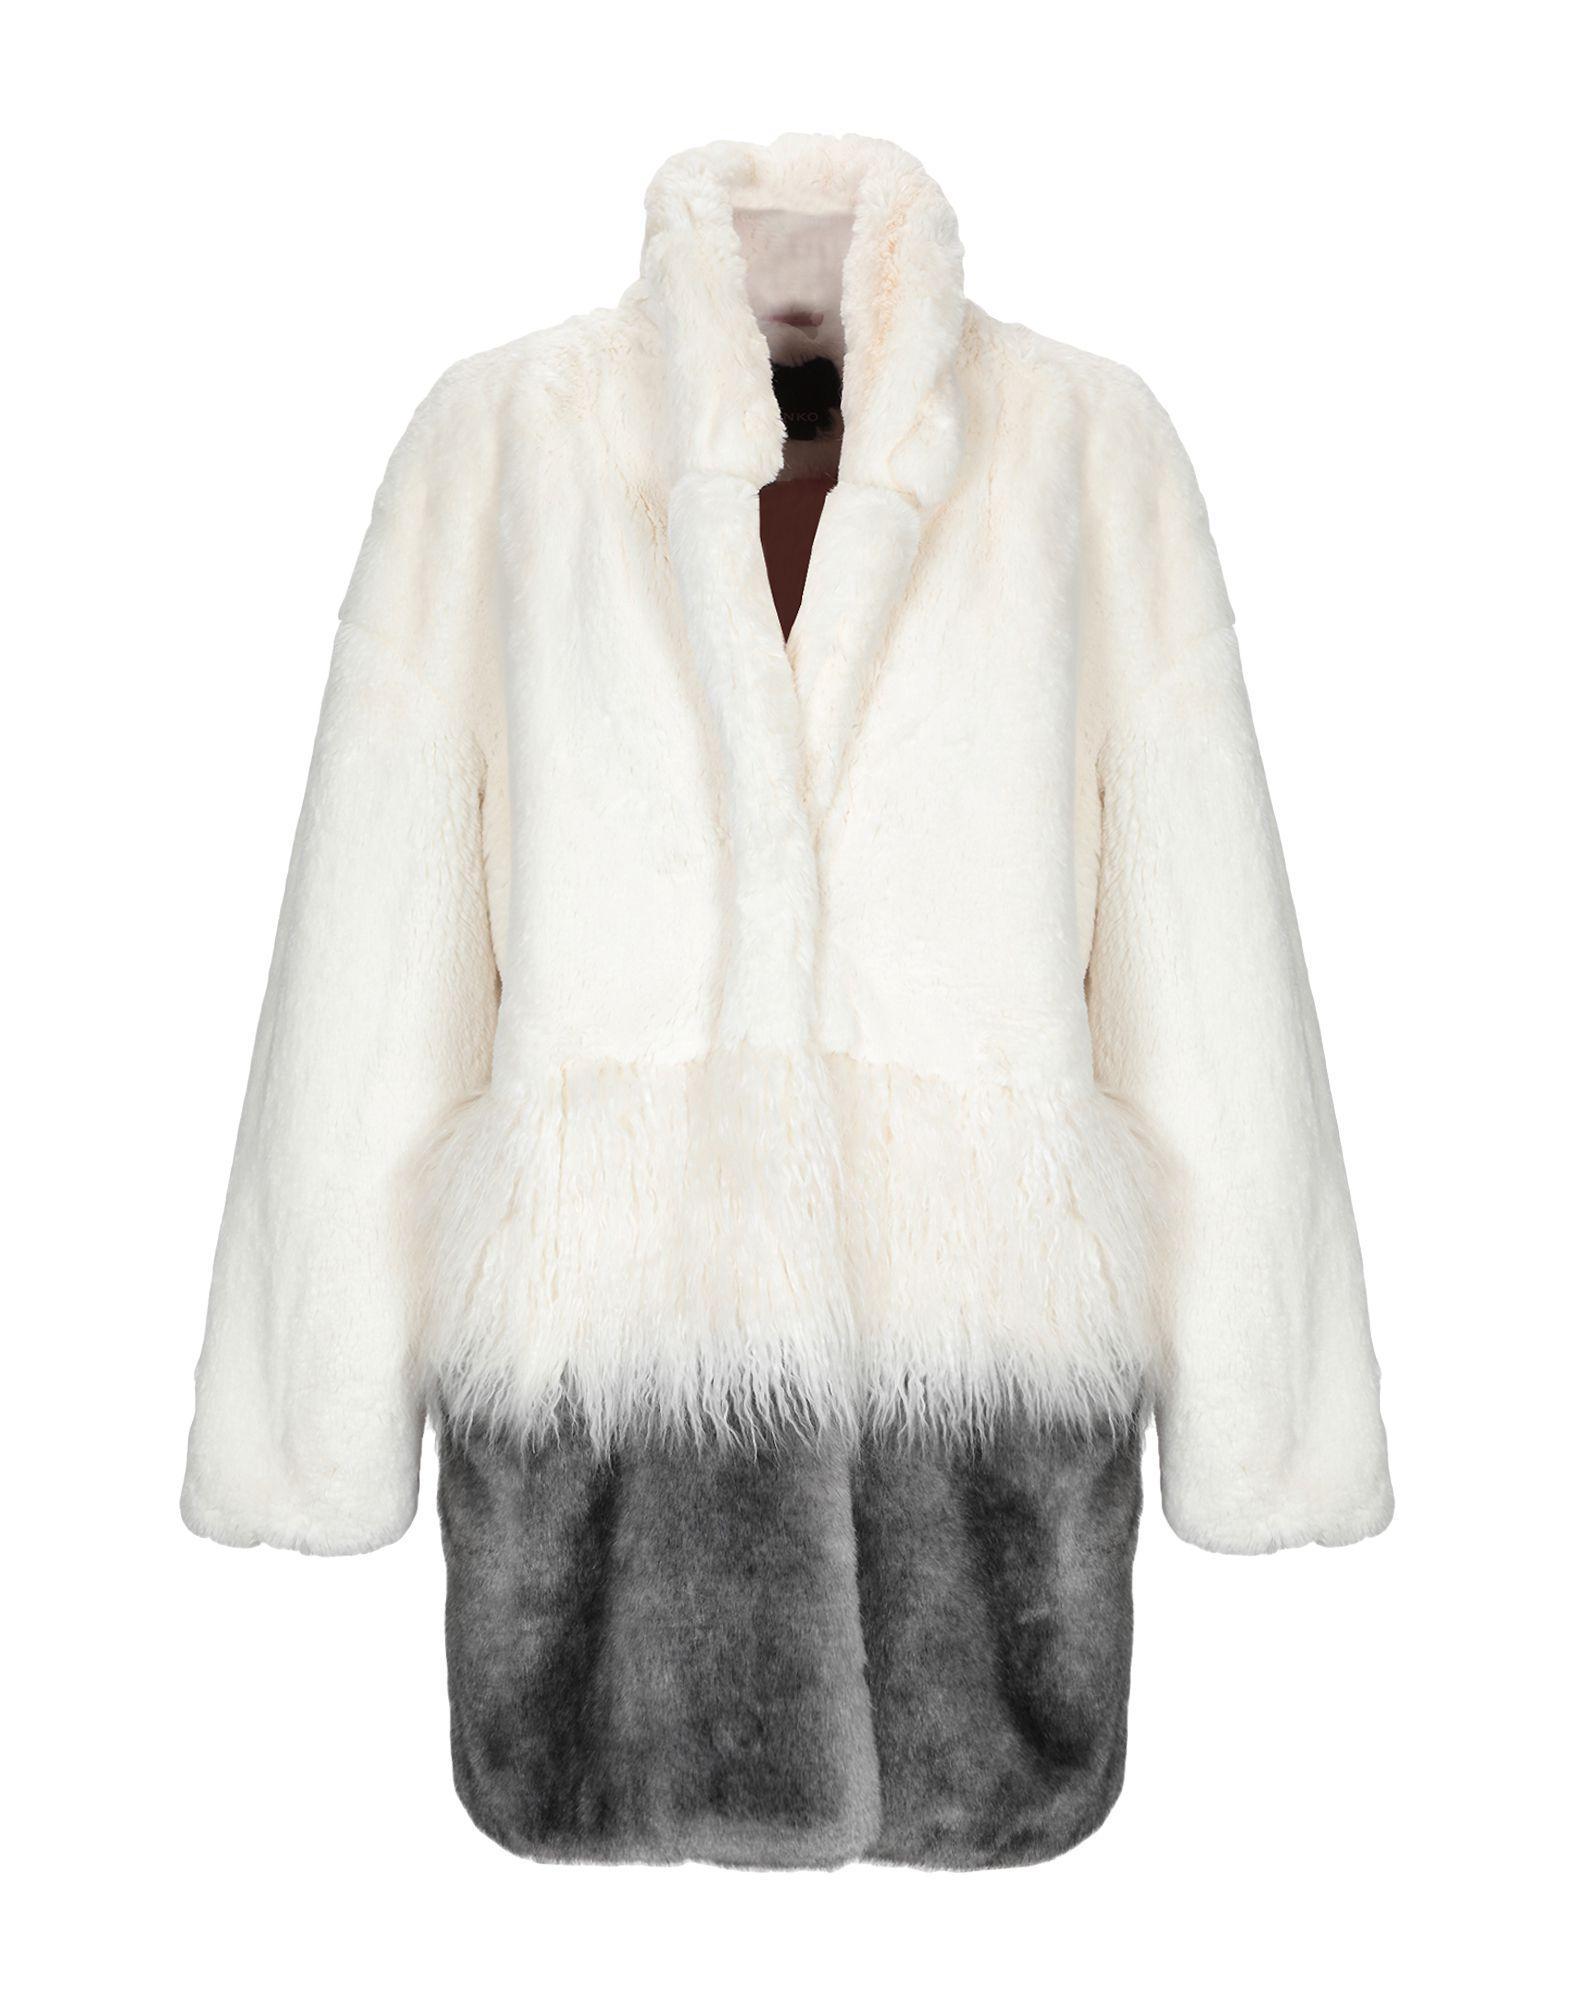 6fb7a3bdf3 Pinko Faux Fur in White - Lyst